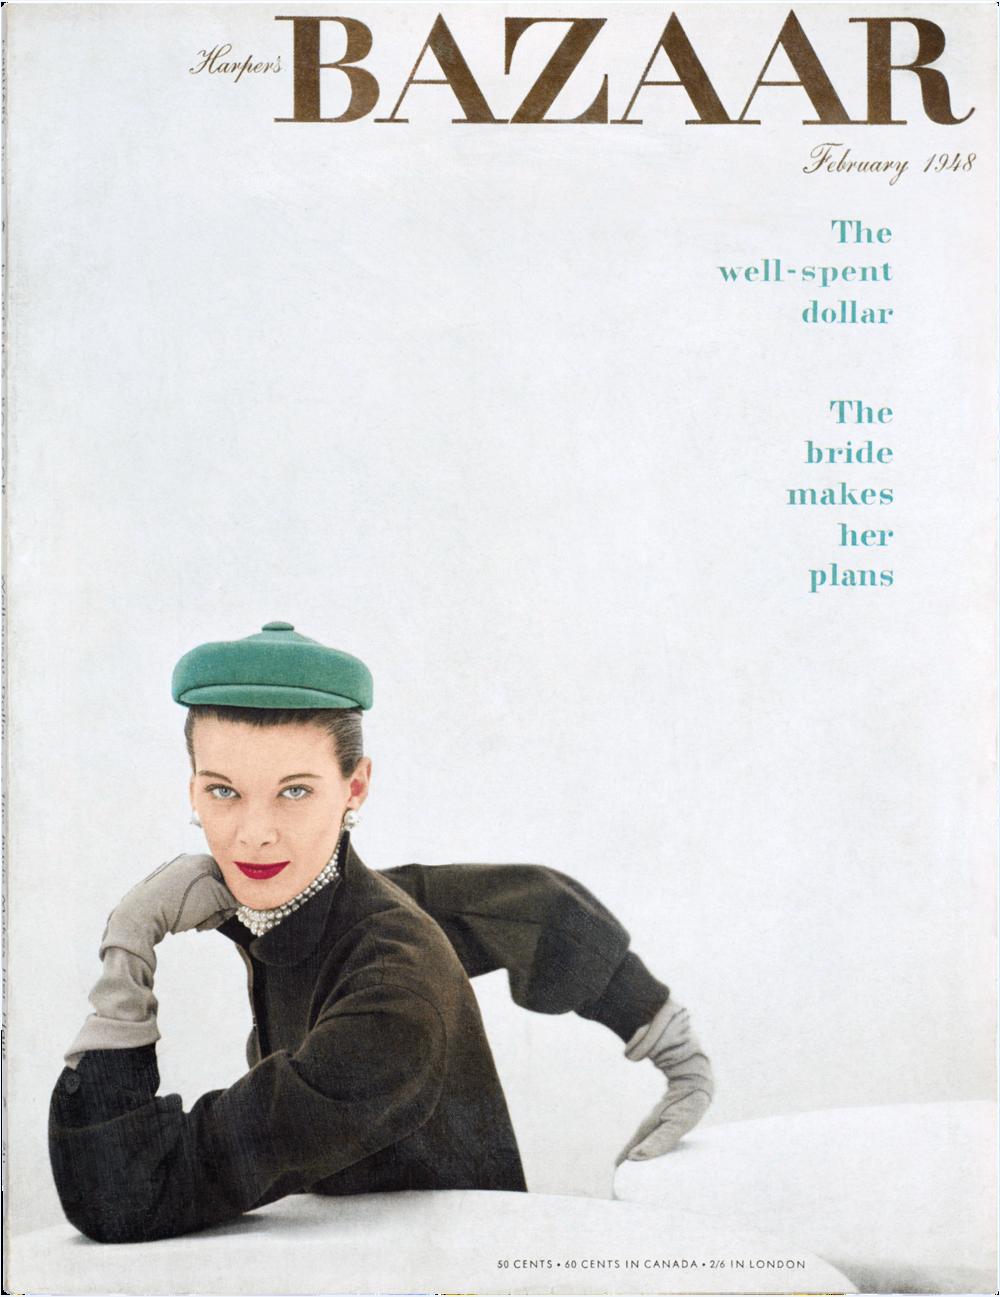 Harper's Bazaar, February 1948